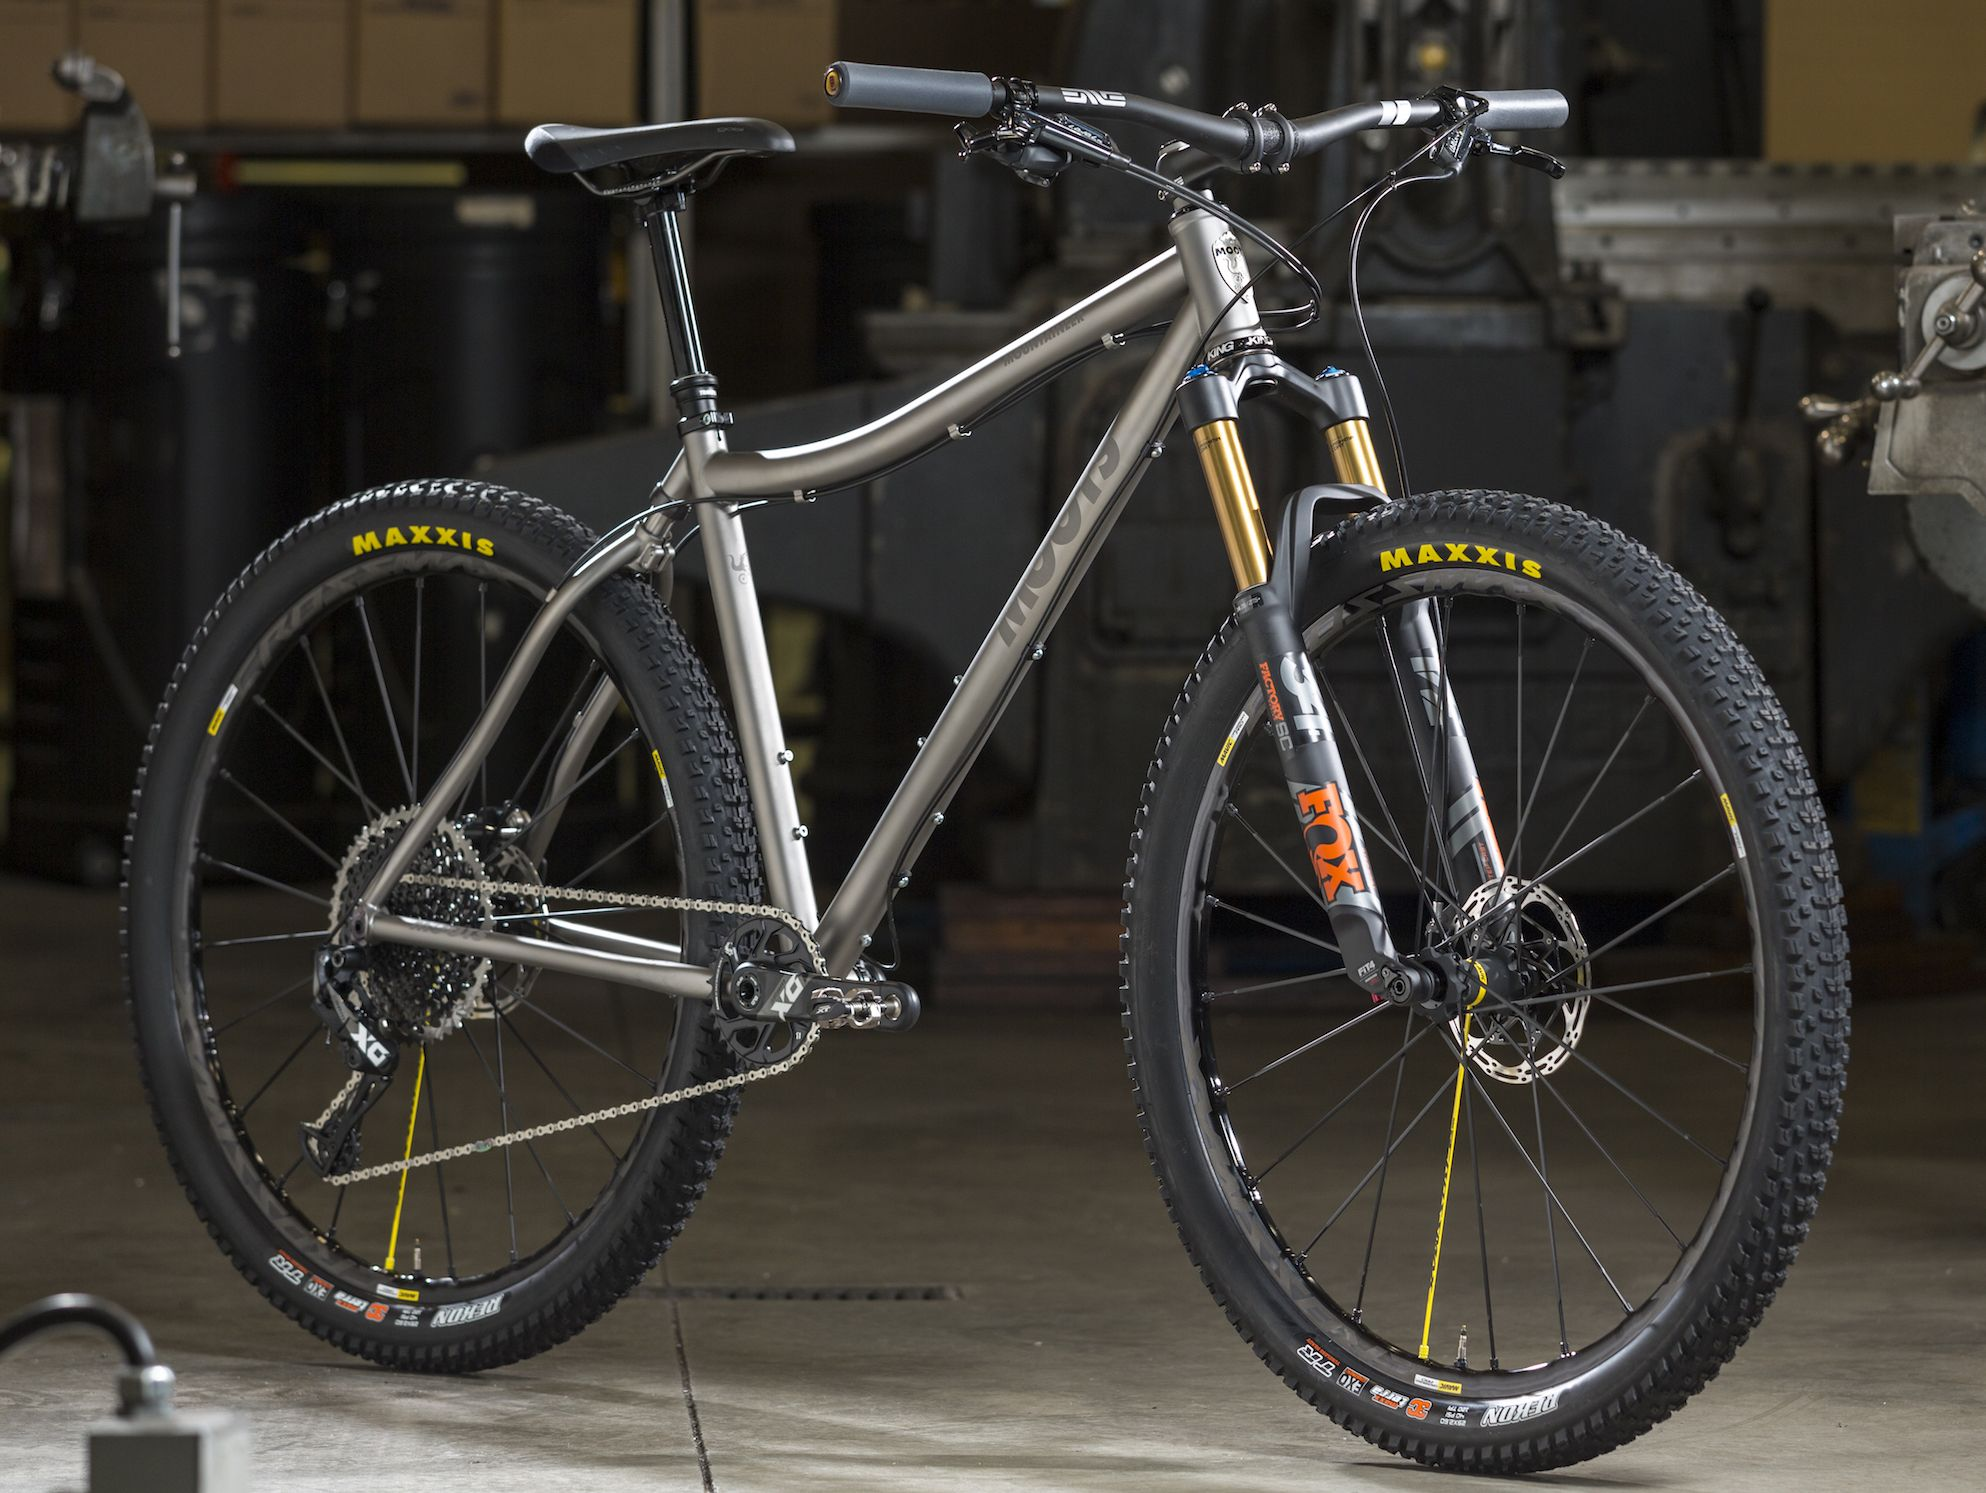 Soft Tail Ybb 29 Inch Wheels Moots Titanium Xc Titanium Bikes